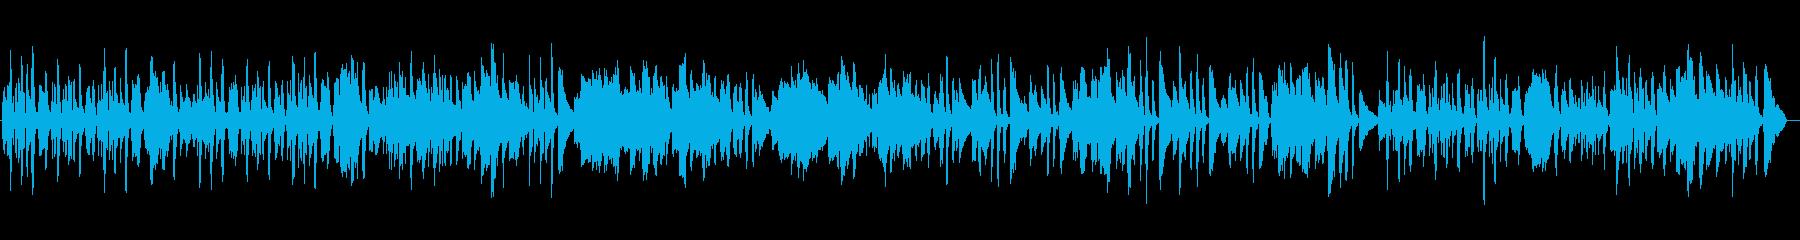 "Gossec ""Gavot"" flute live performance's reproduced waveform"